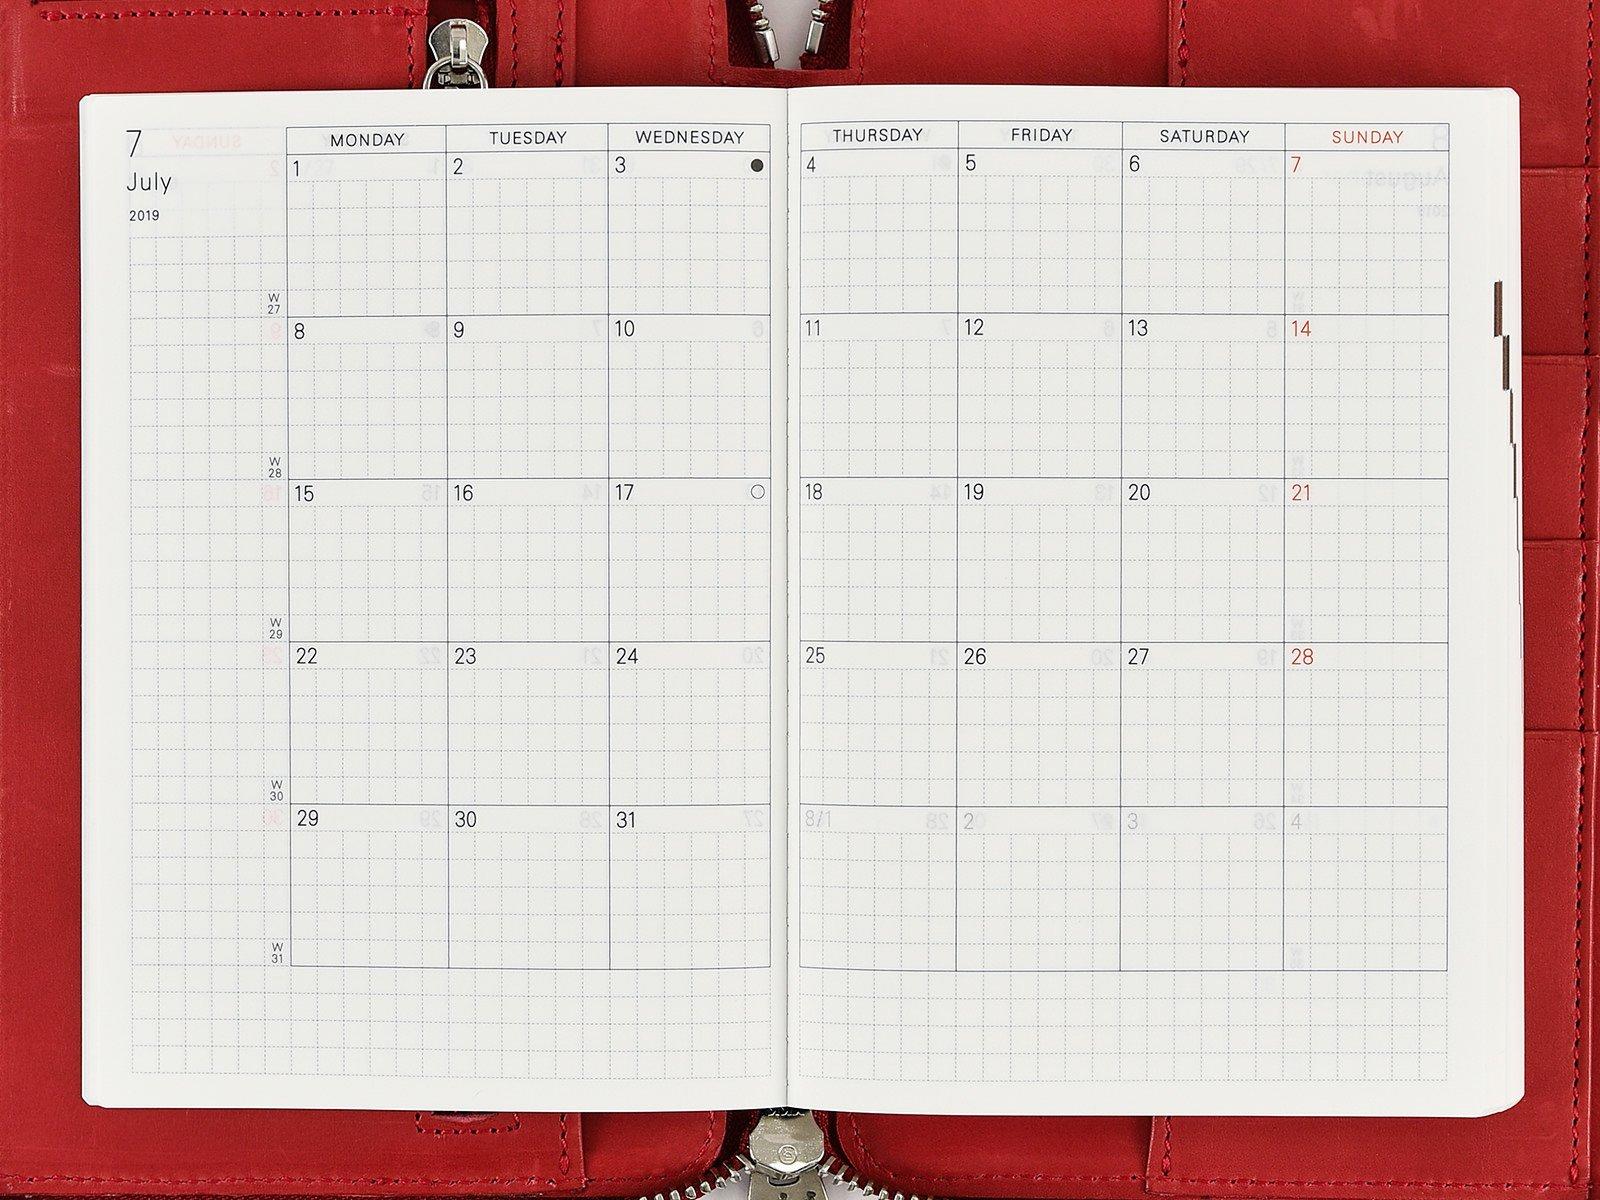 Monthly Calendar – Hobonichi Techo Planner – Book Buying Guide Calendar 2019 Book